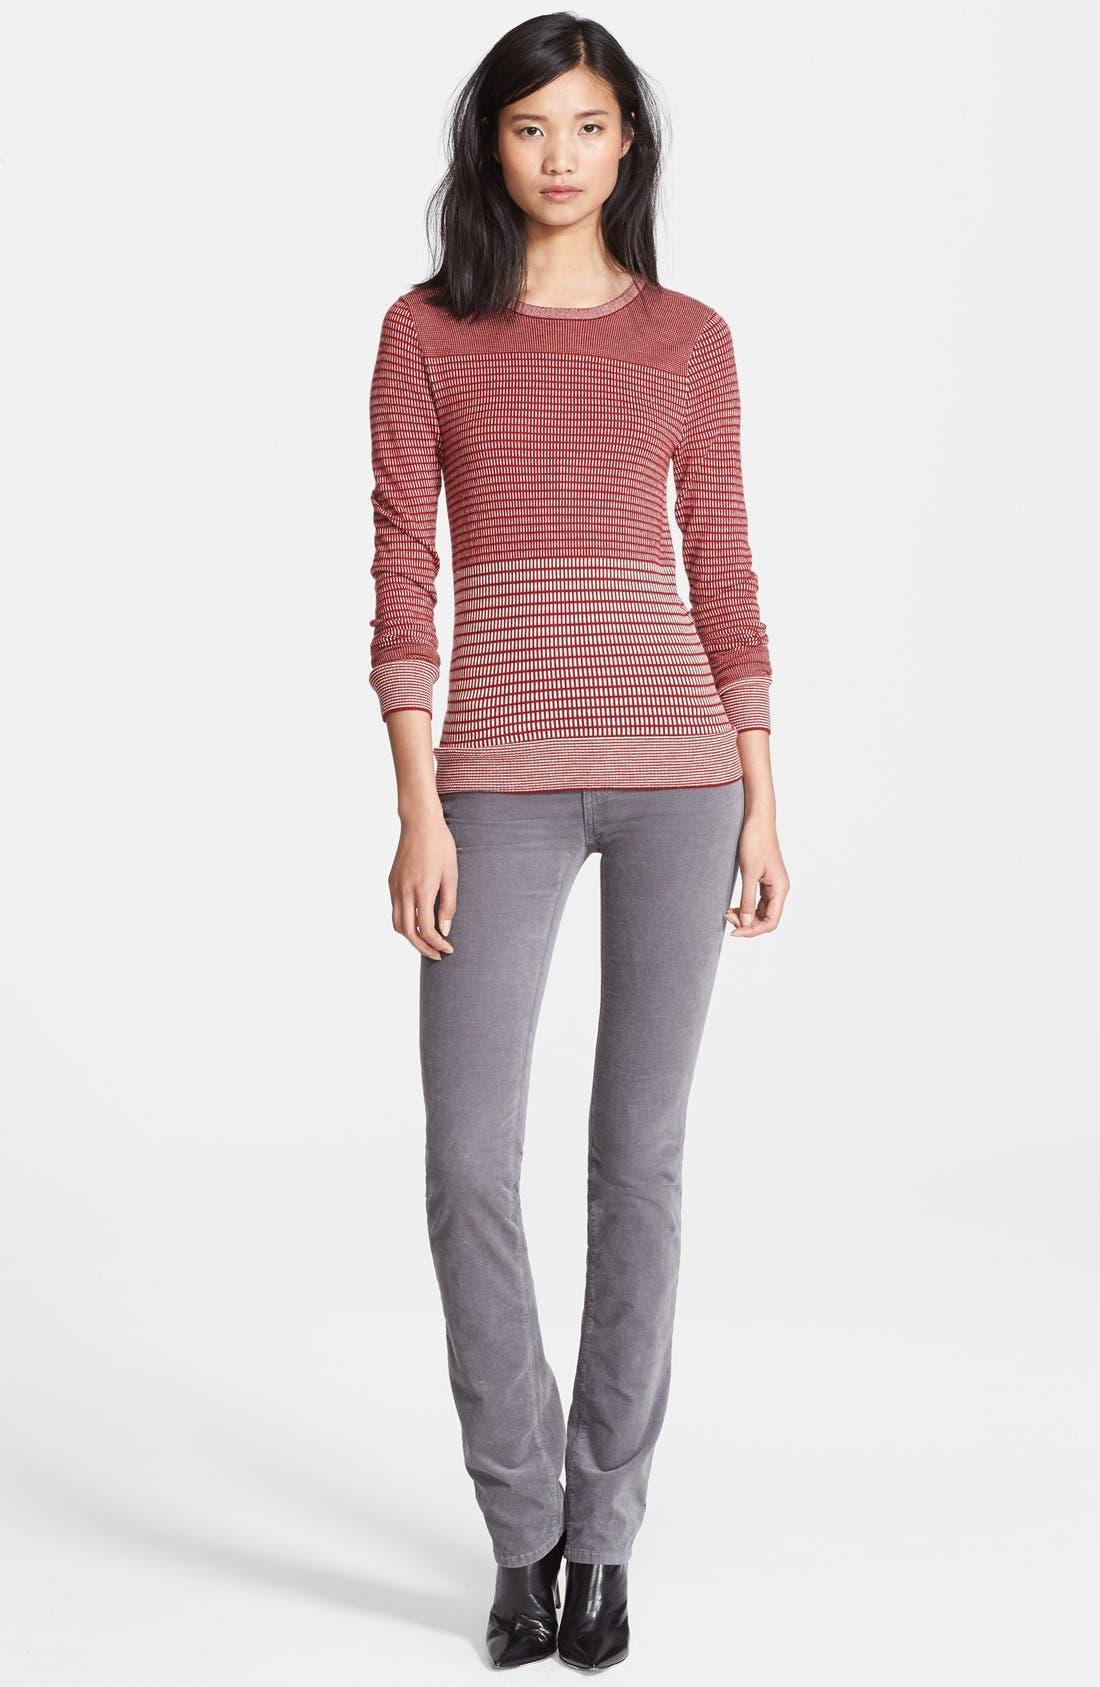 Alternate Image 1 Selected - Charlotte Gainsbourg for Current/Elliott Jacquard Sweater